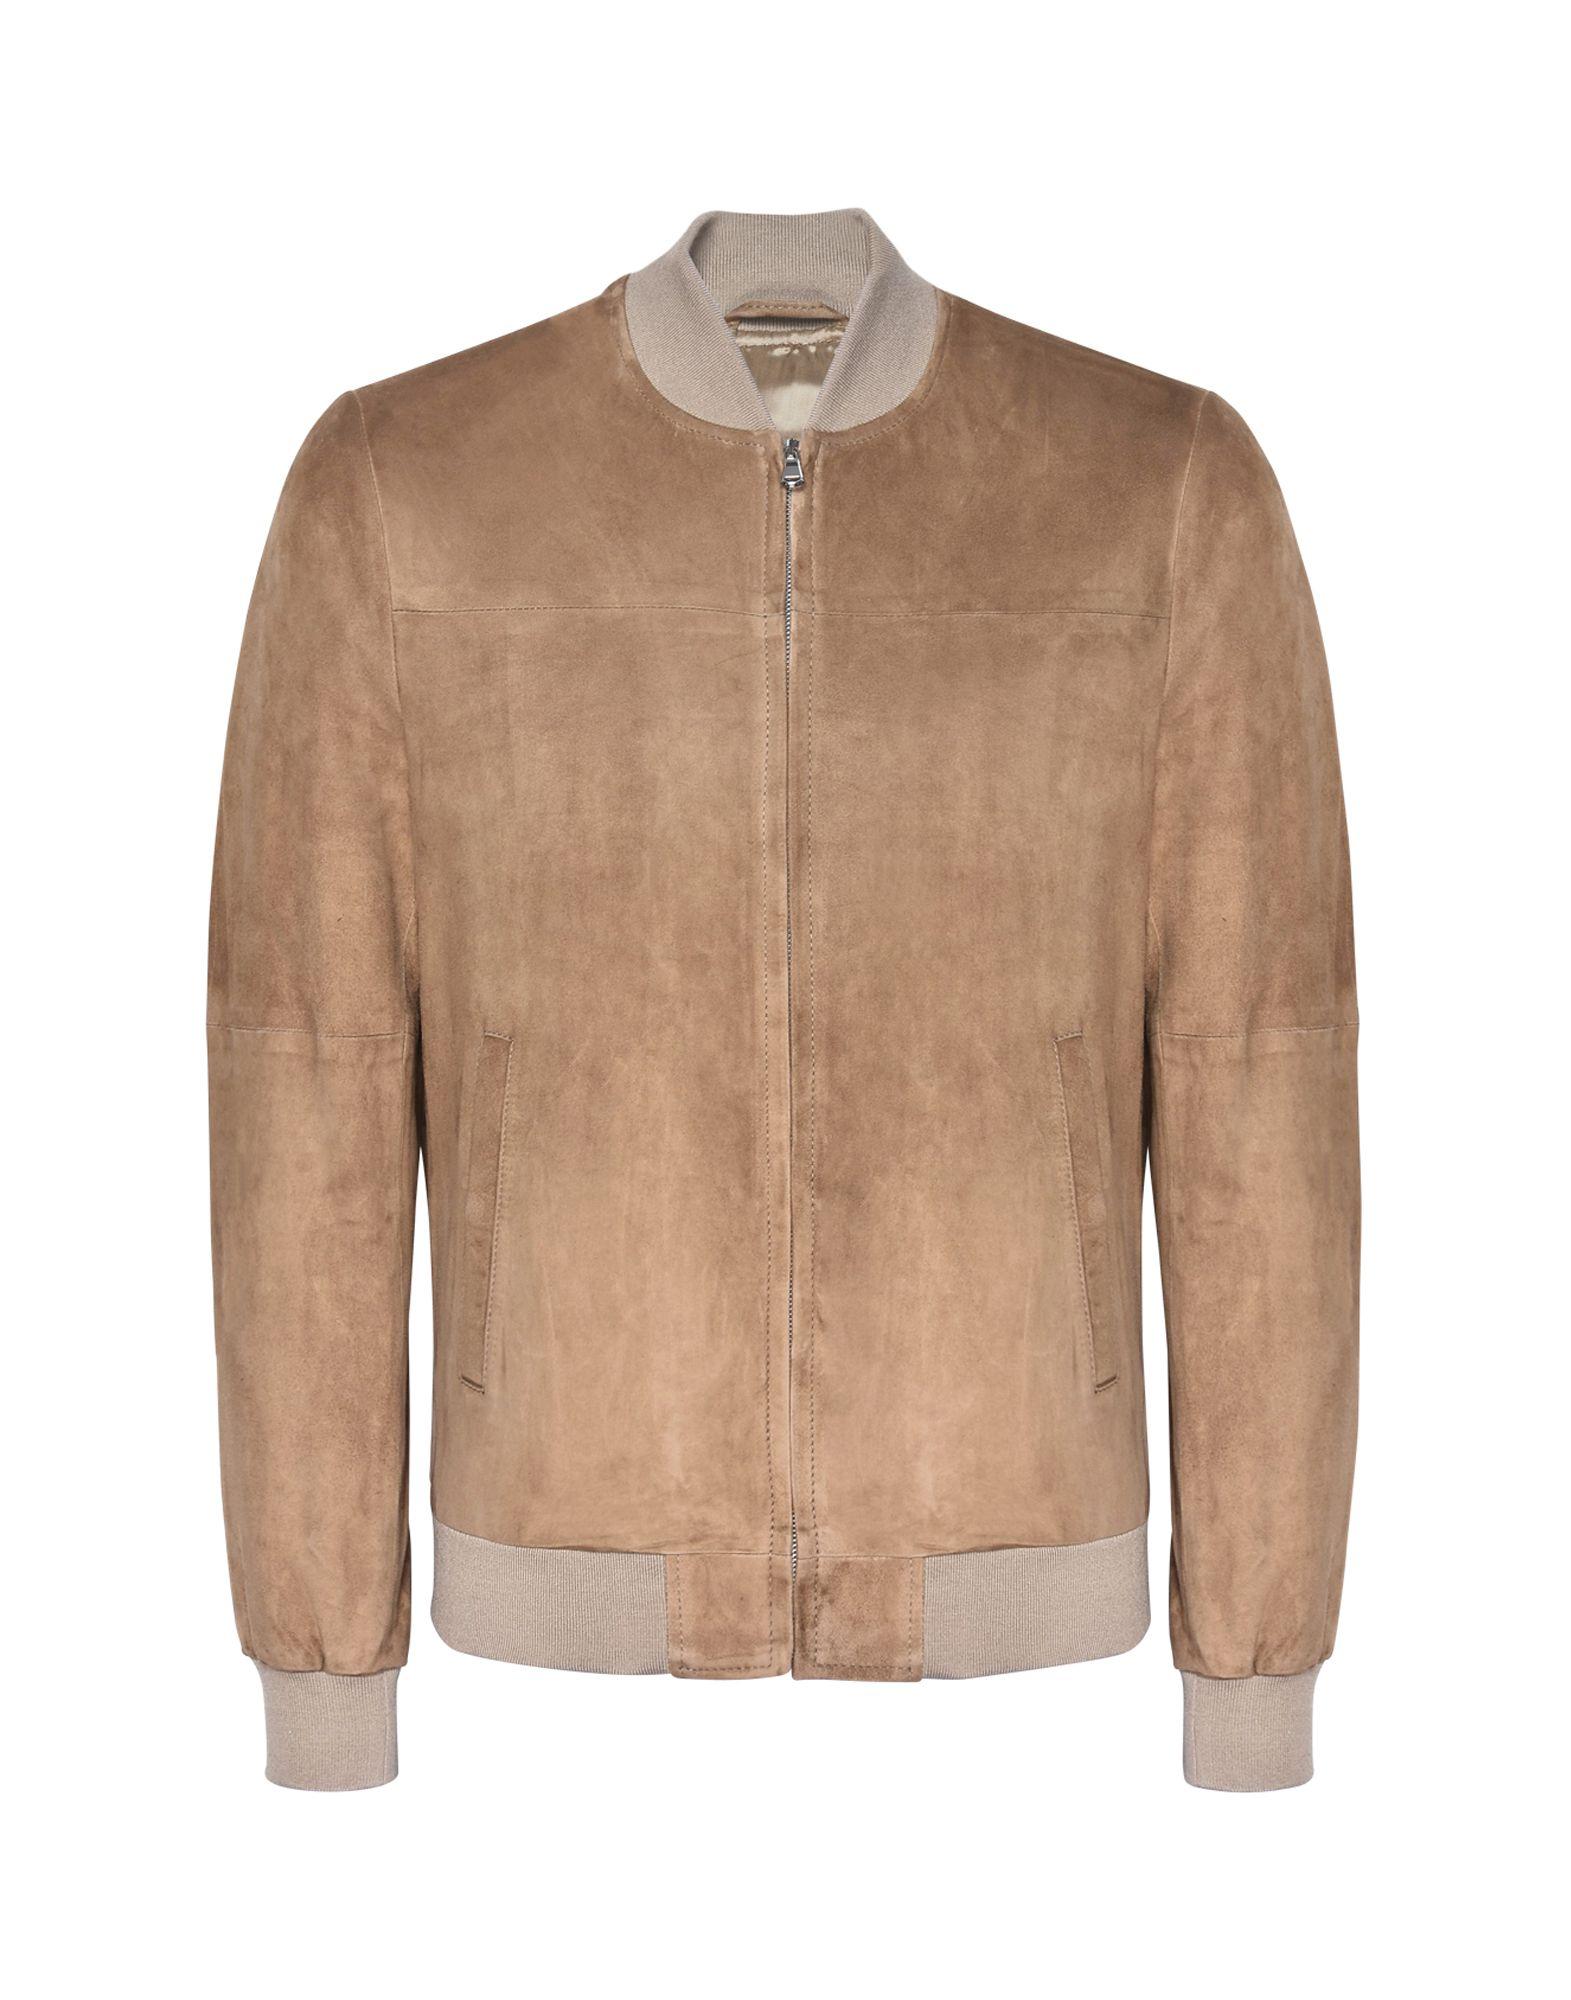 8 Куртка замшевая куртка